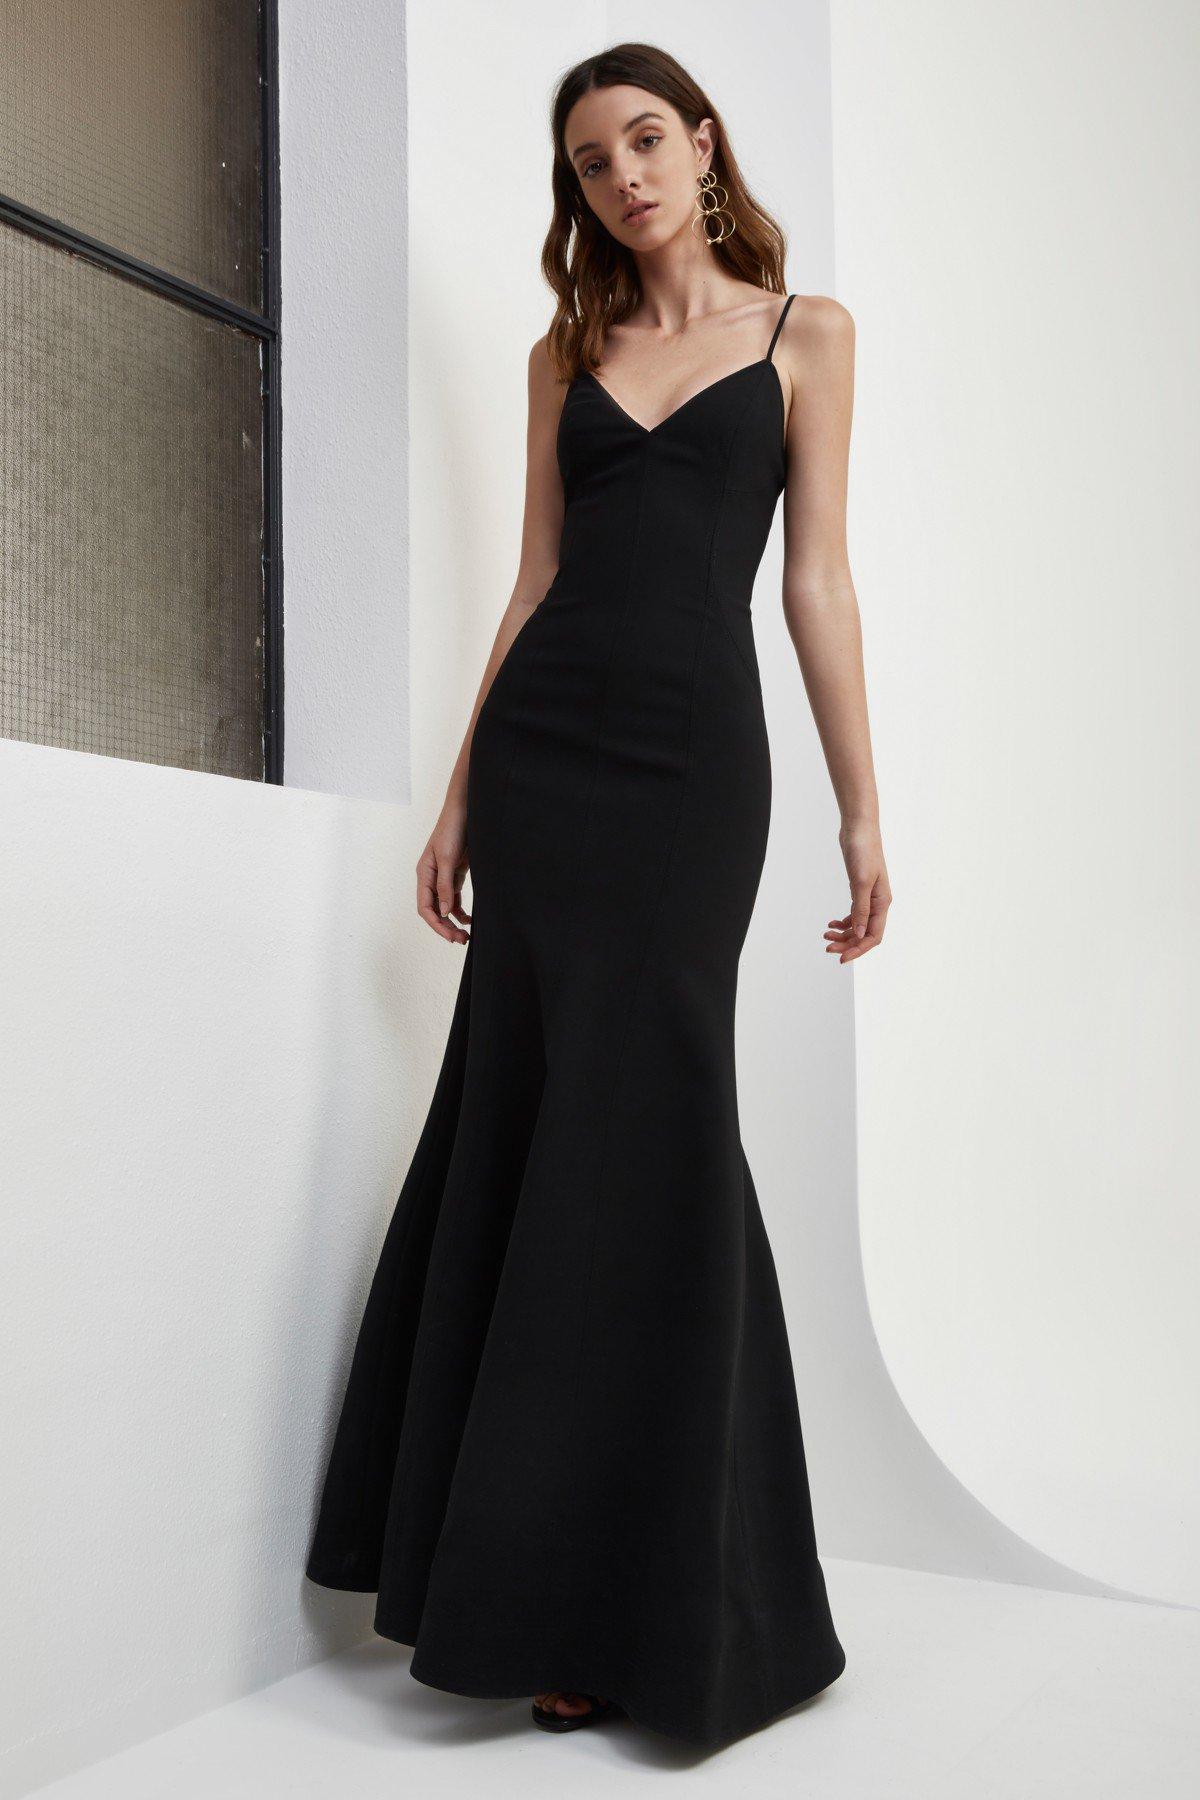 Shop C/MEO Right Now Full Night Dress.